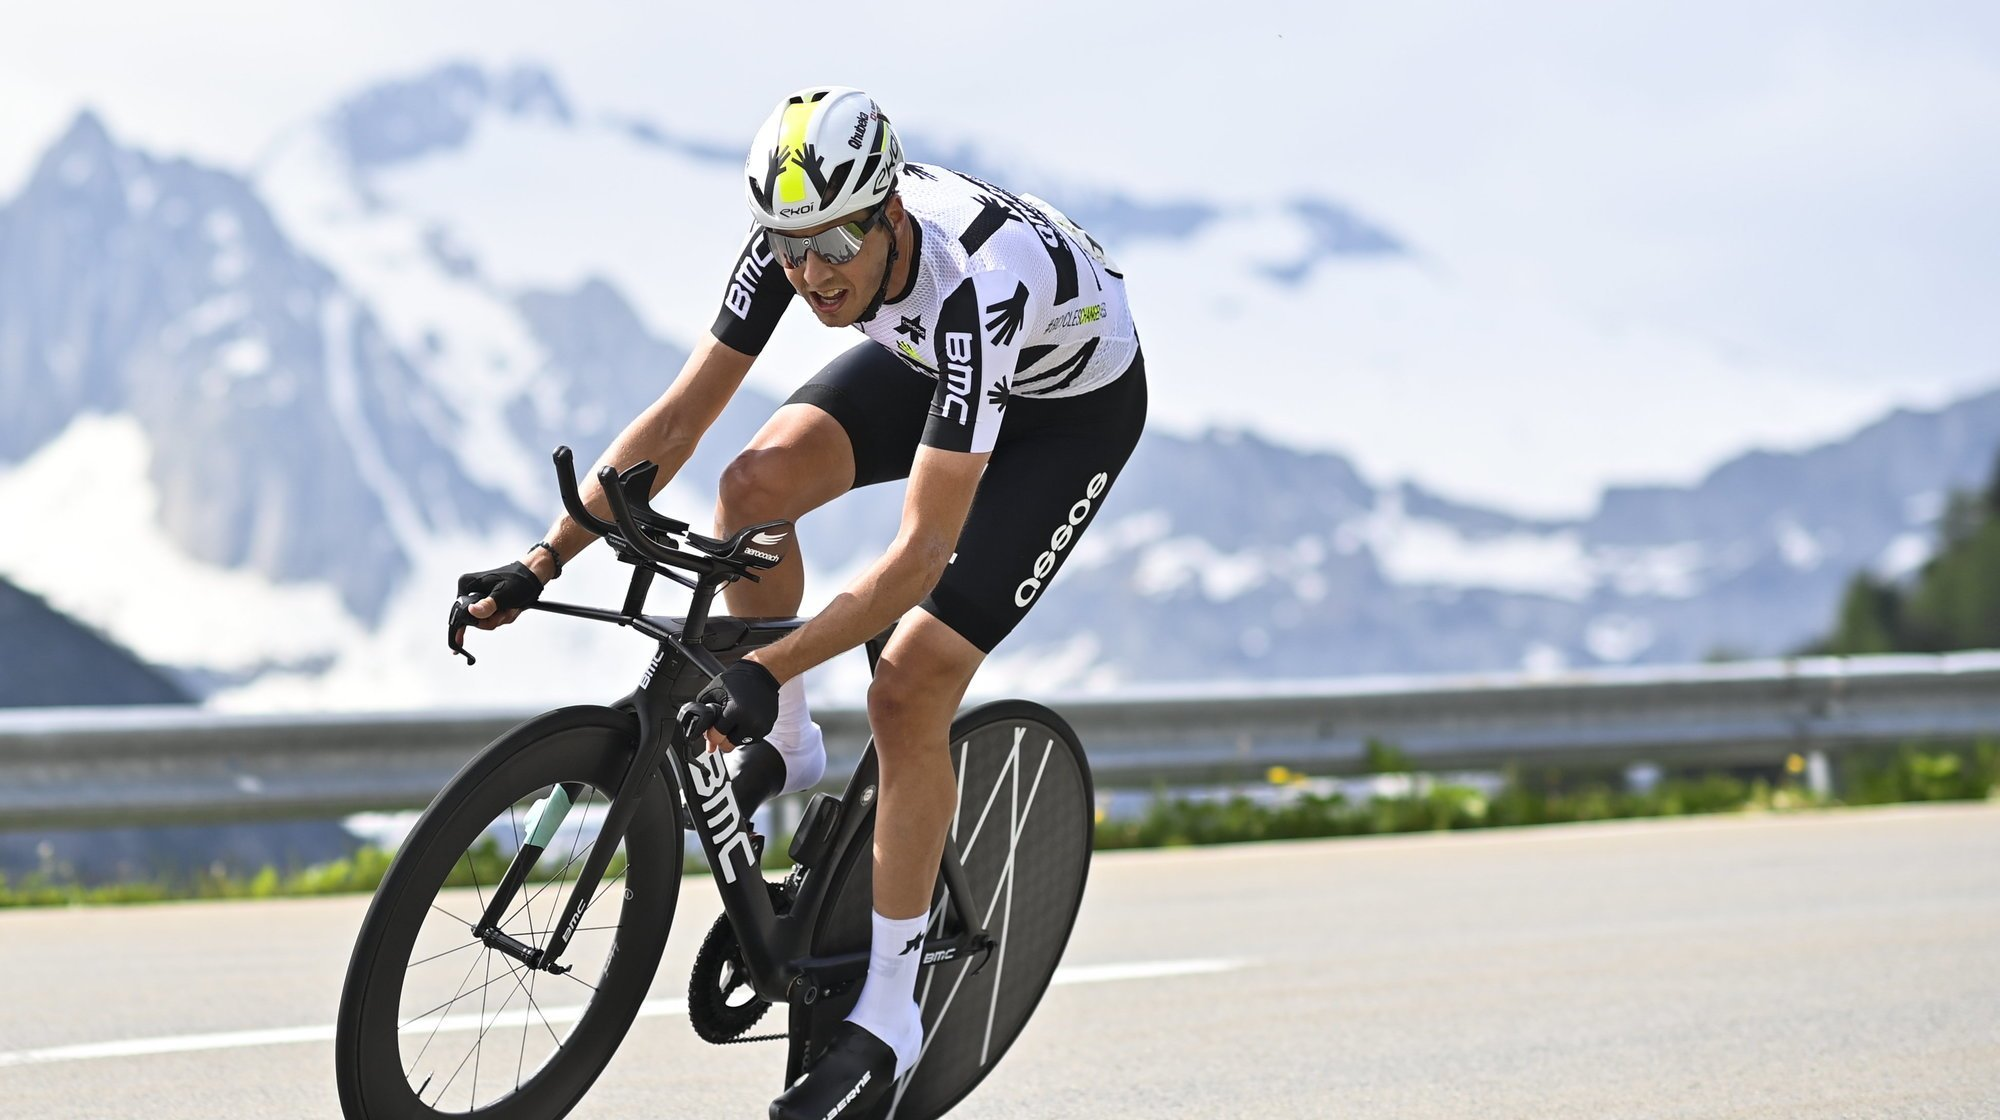 Cyclisme: Kilian Frankiny devra-t-il mettre pied à terre?